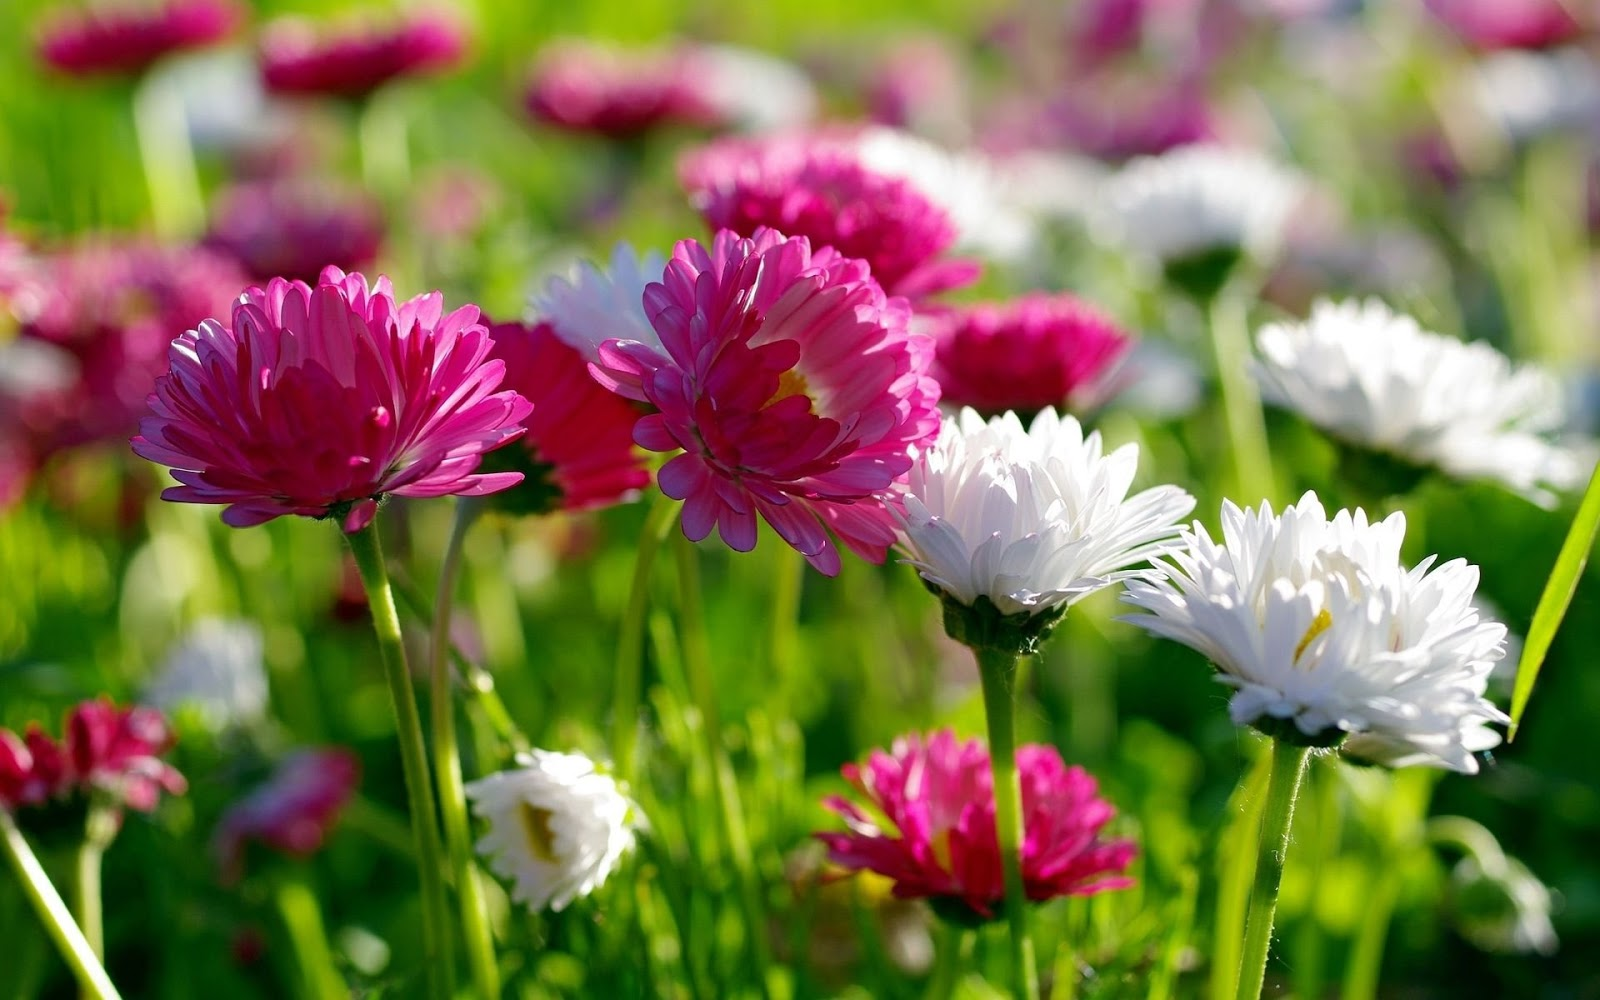 HD WALLPAPERS FOR DESKTOP: spring flowers